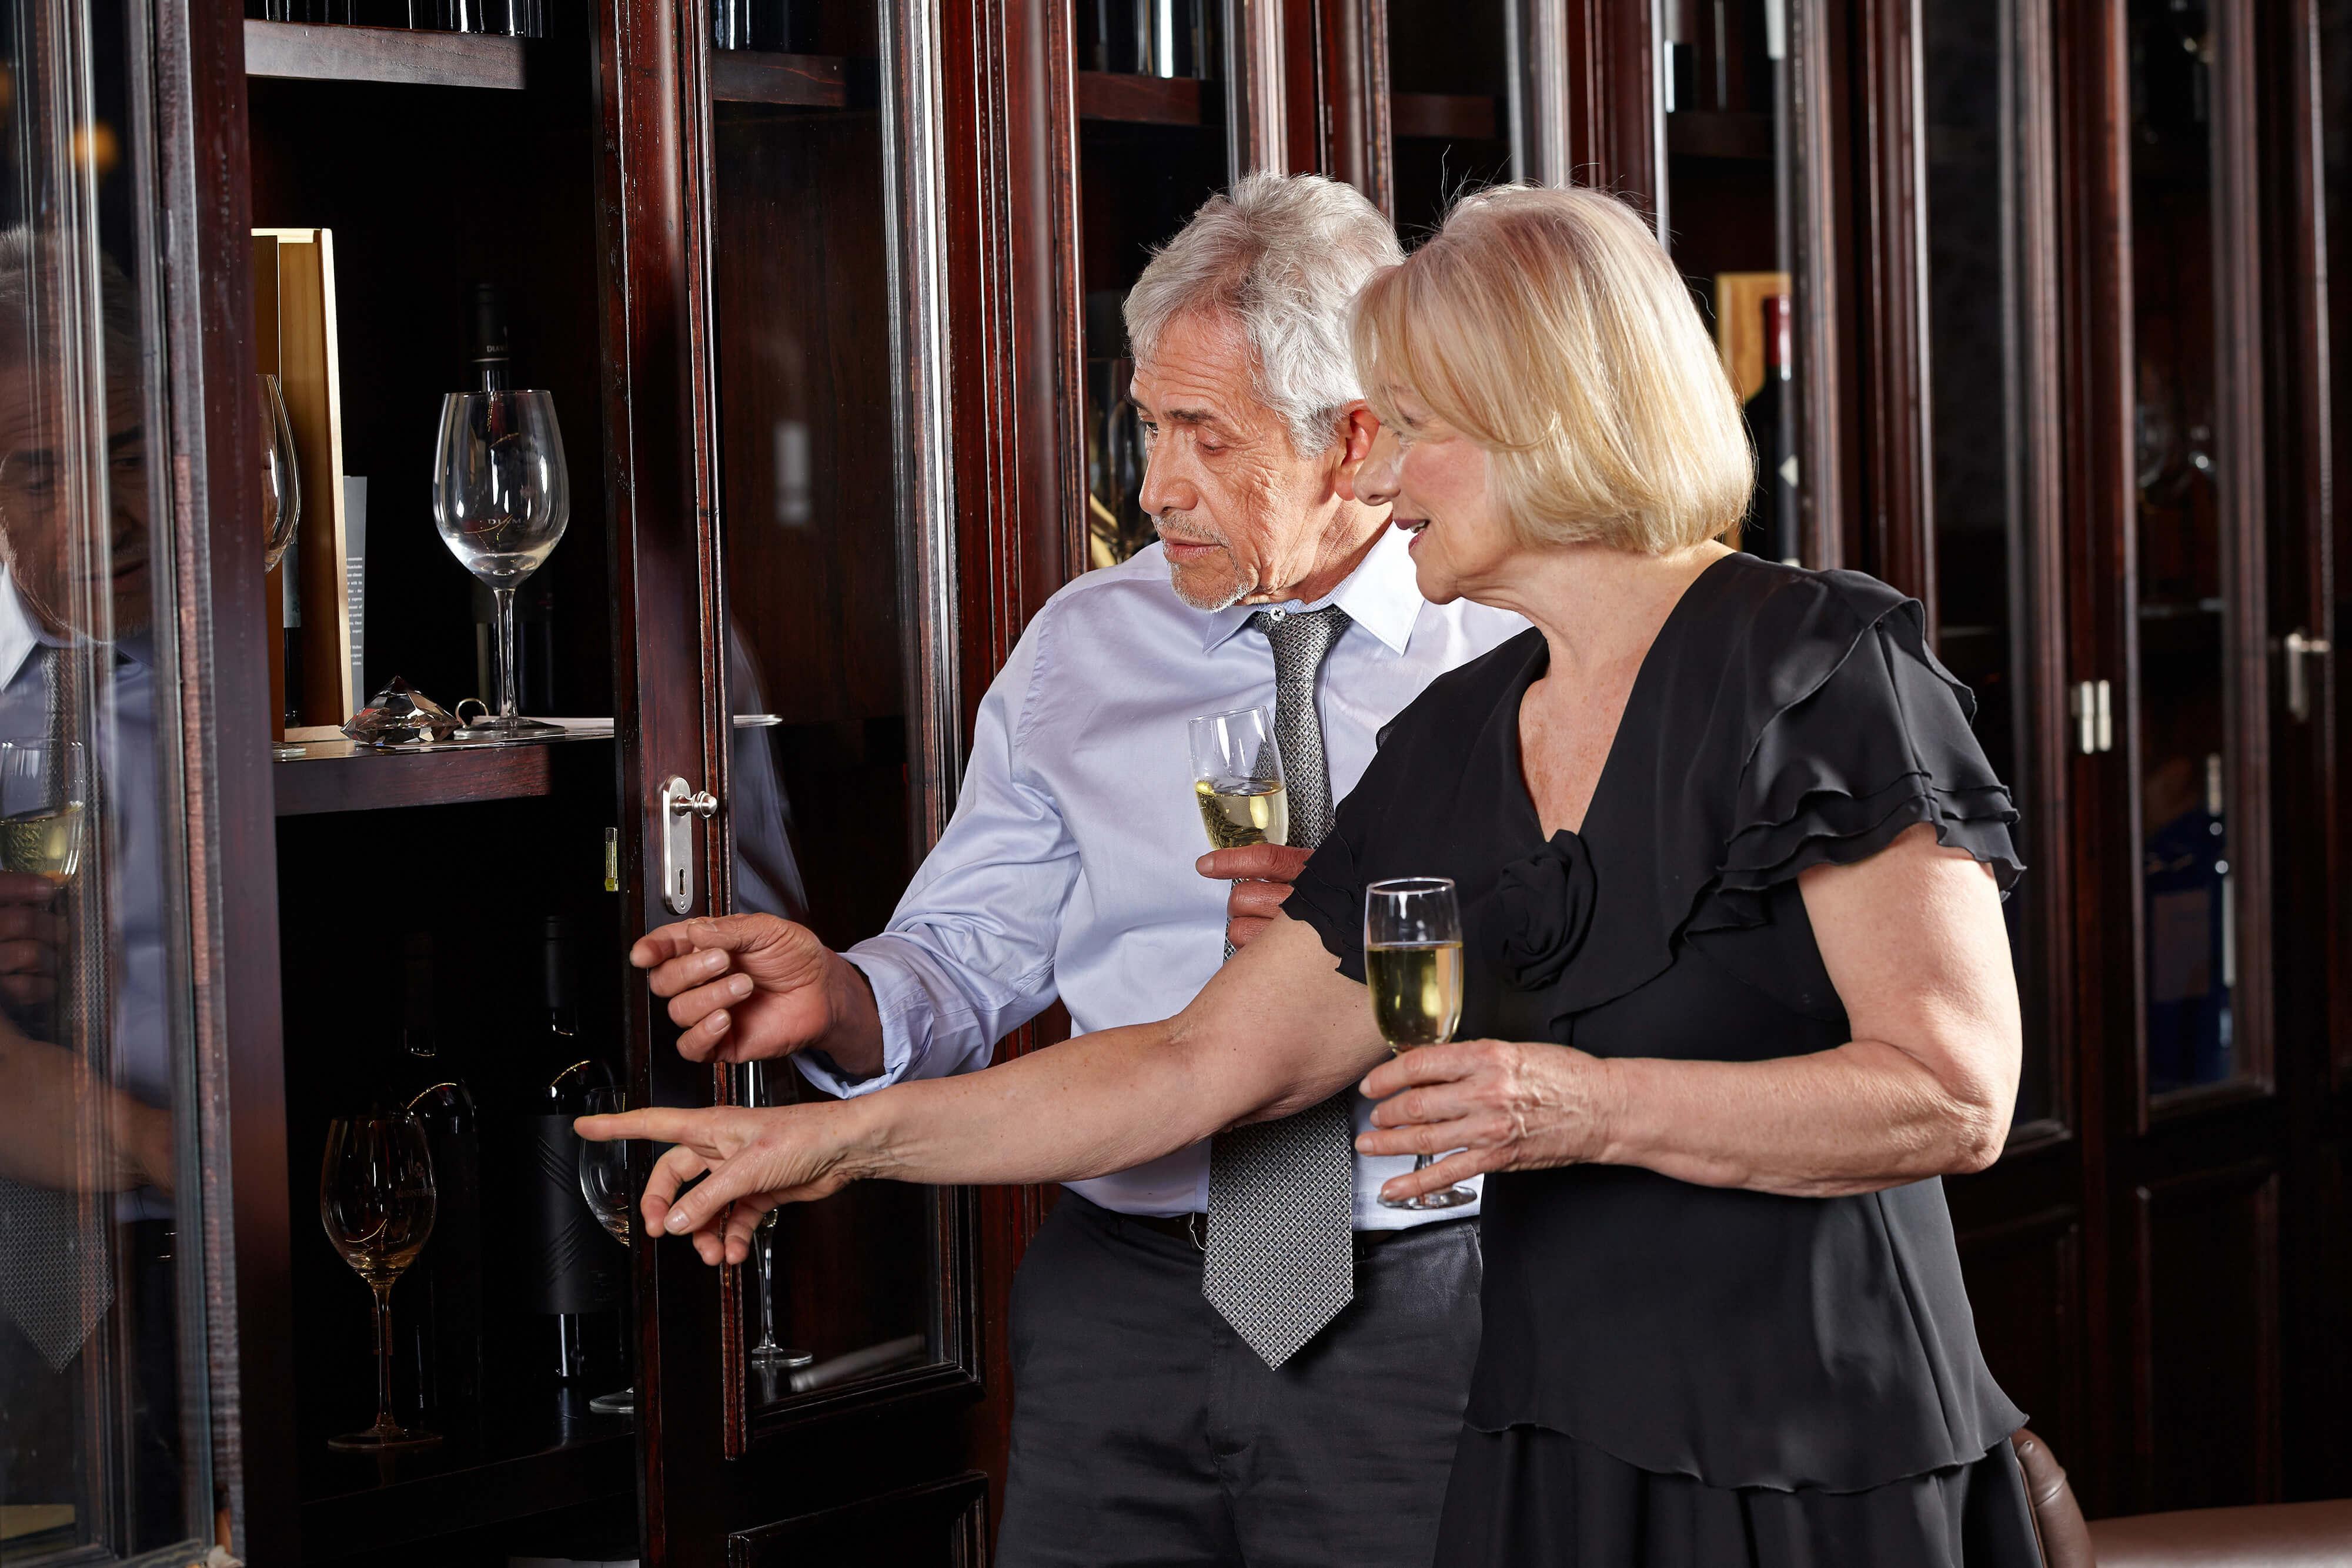 Art & Wine Tasting Team Building Event in Park City Utah | Park City Utah Resort & Spa | Westgate Resorts